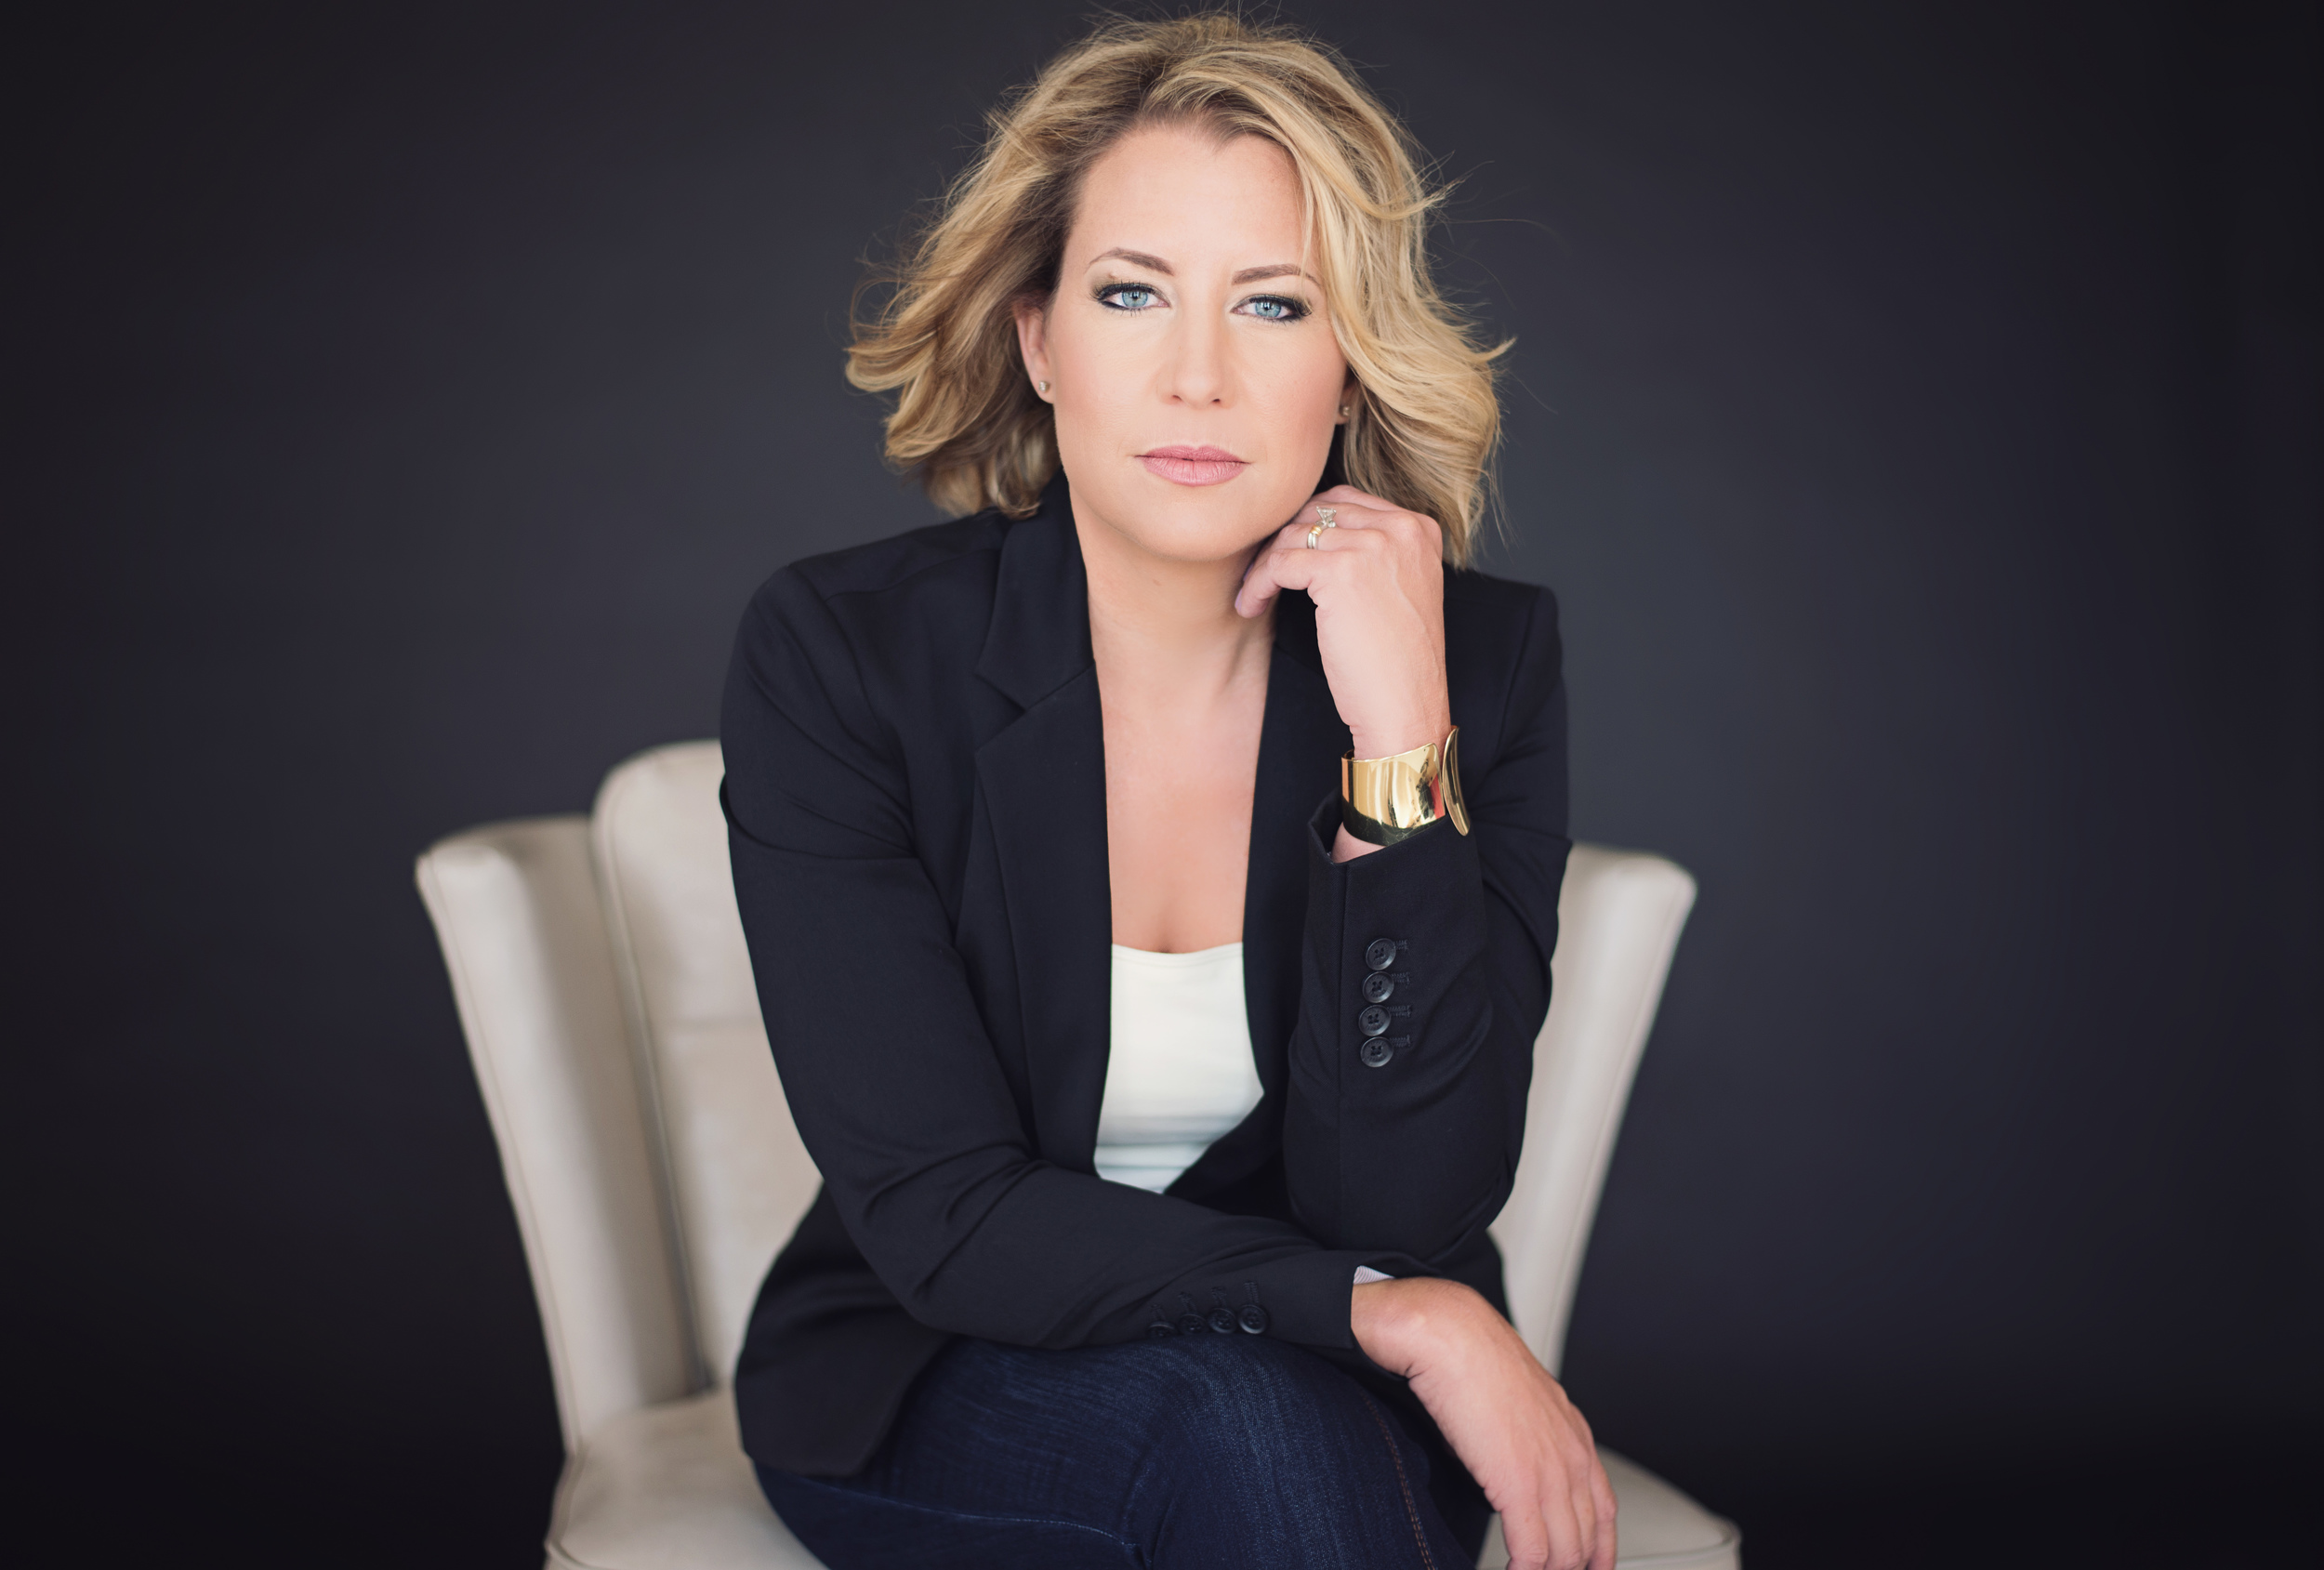 Tracy Modern Glamour Professional Head Shot Abilene Texas